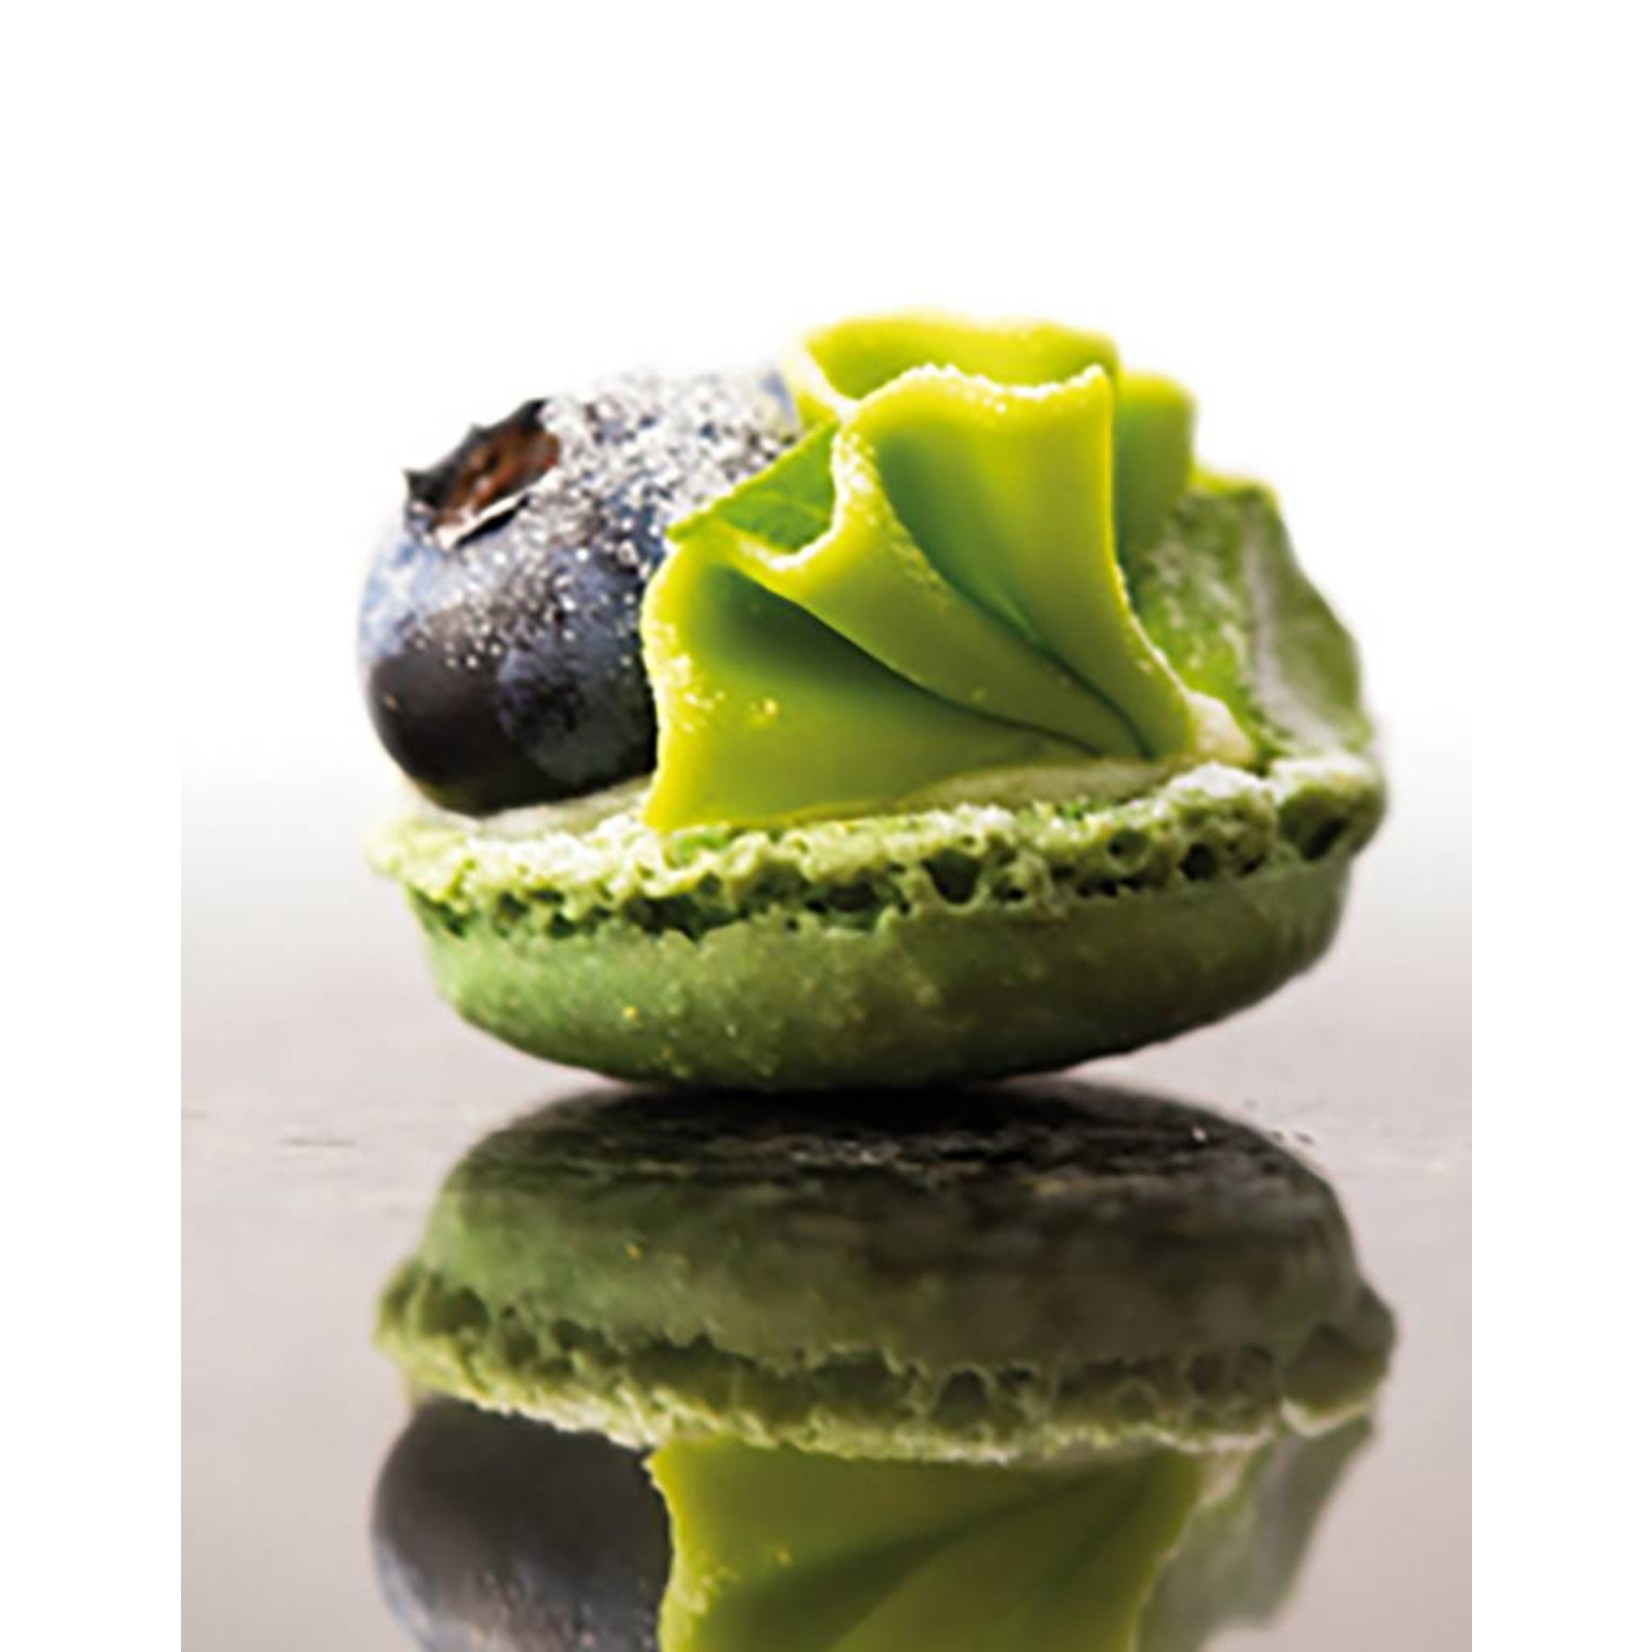 Dobla Dobla - Green Chocolate Forest Shavings - 1.3'' (2.2lb), 93191   78012